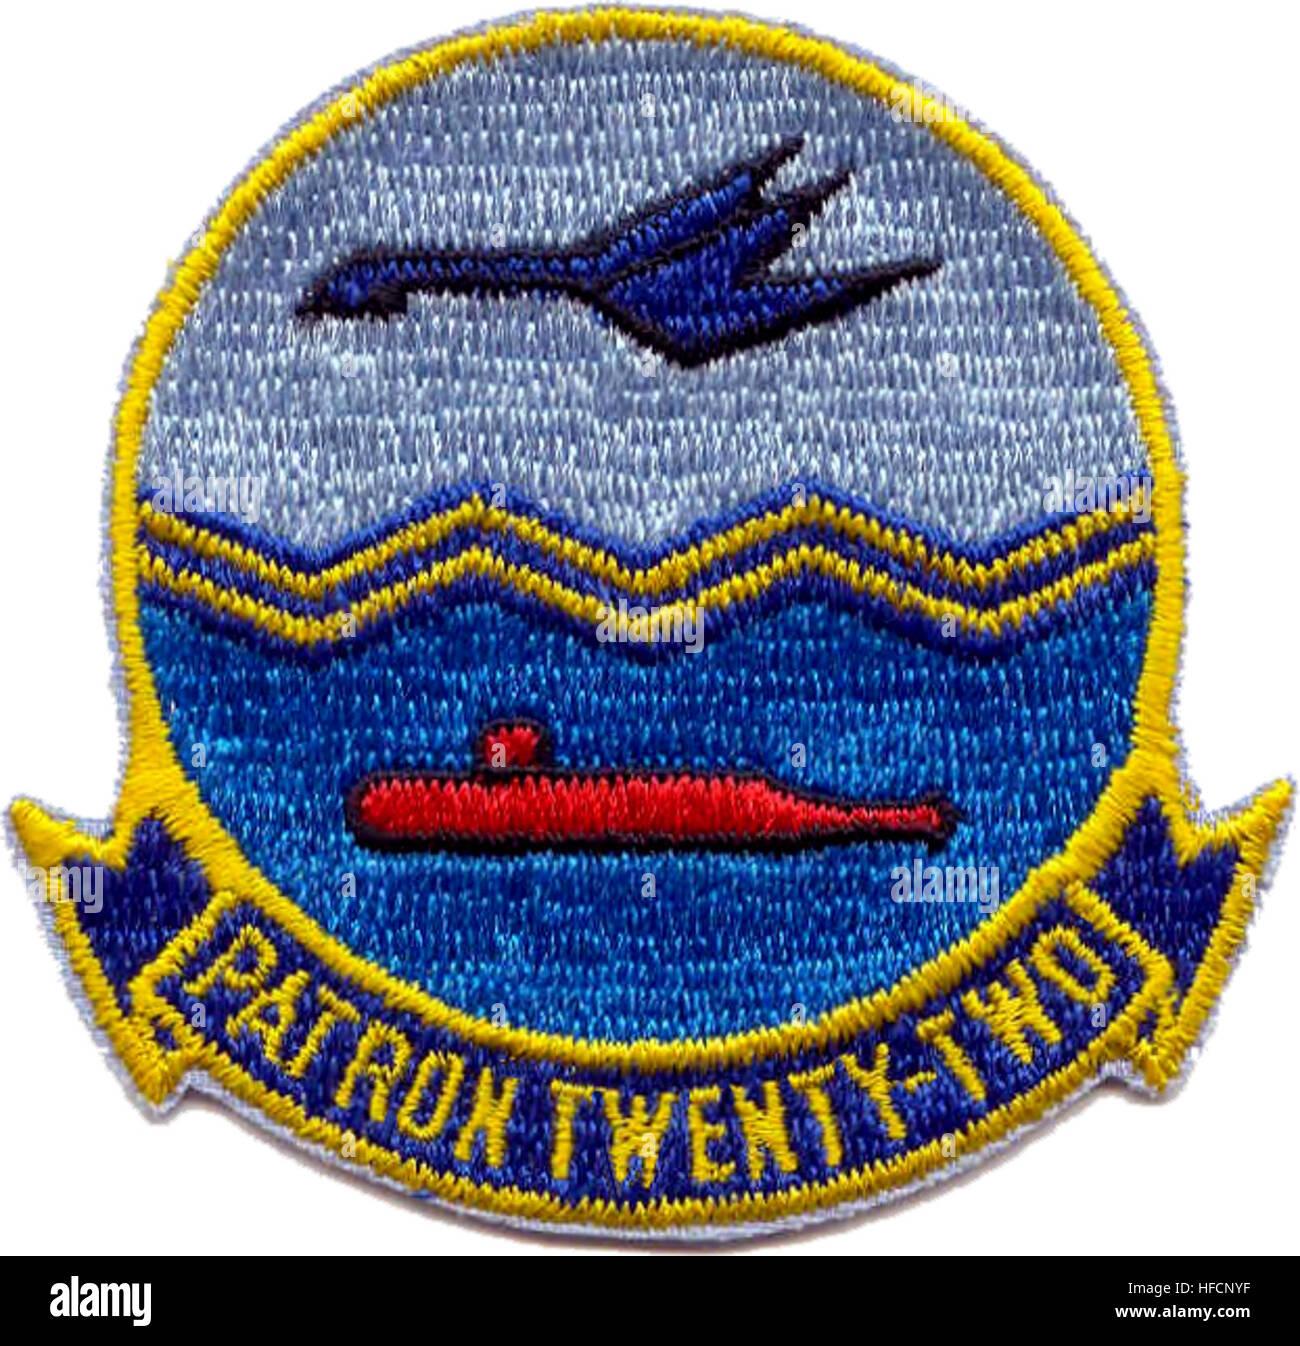 Patrol squadron 22 us navy insignia 1964 stock photo royalty patrol squadron 22 us navy insignia 1964 biocorpaavc